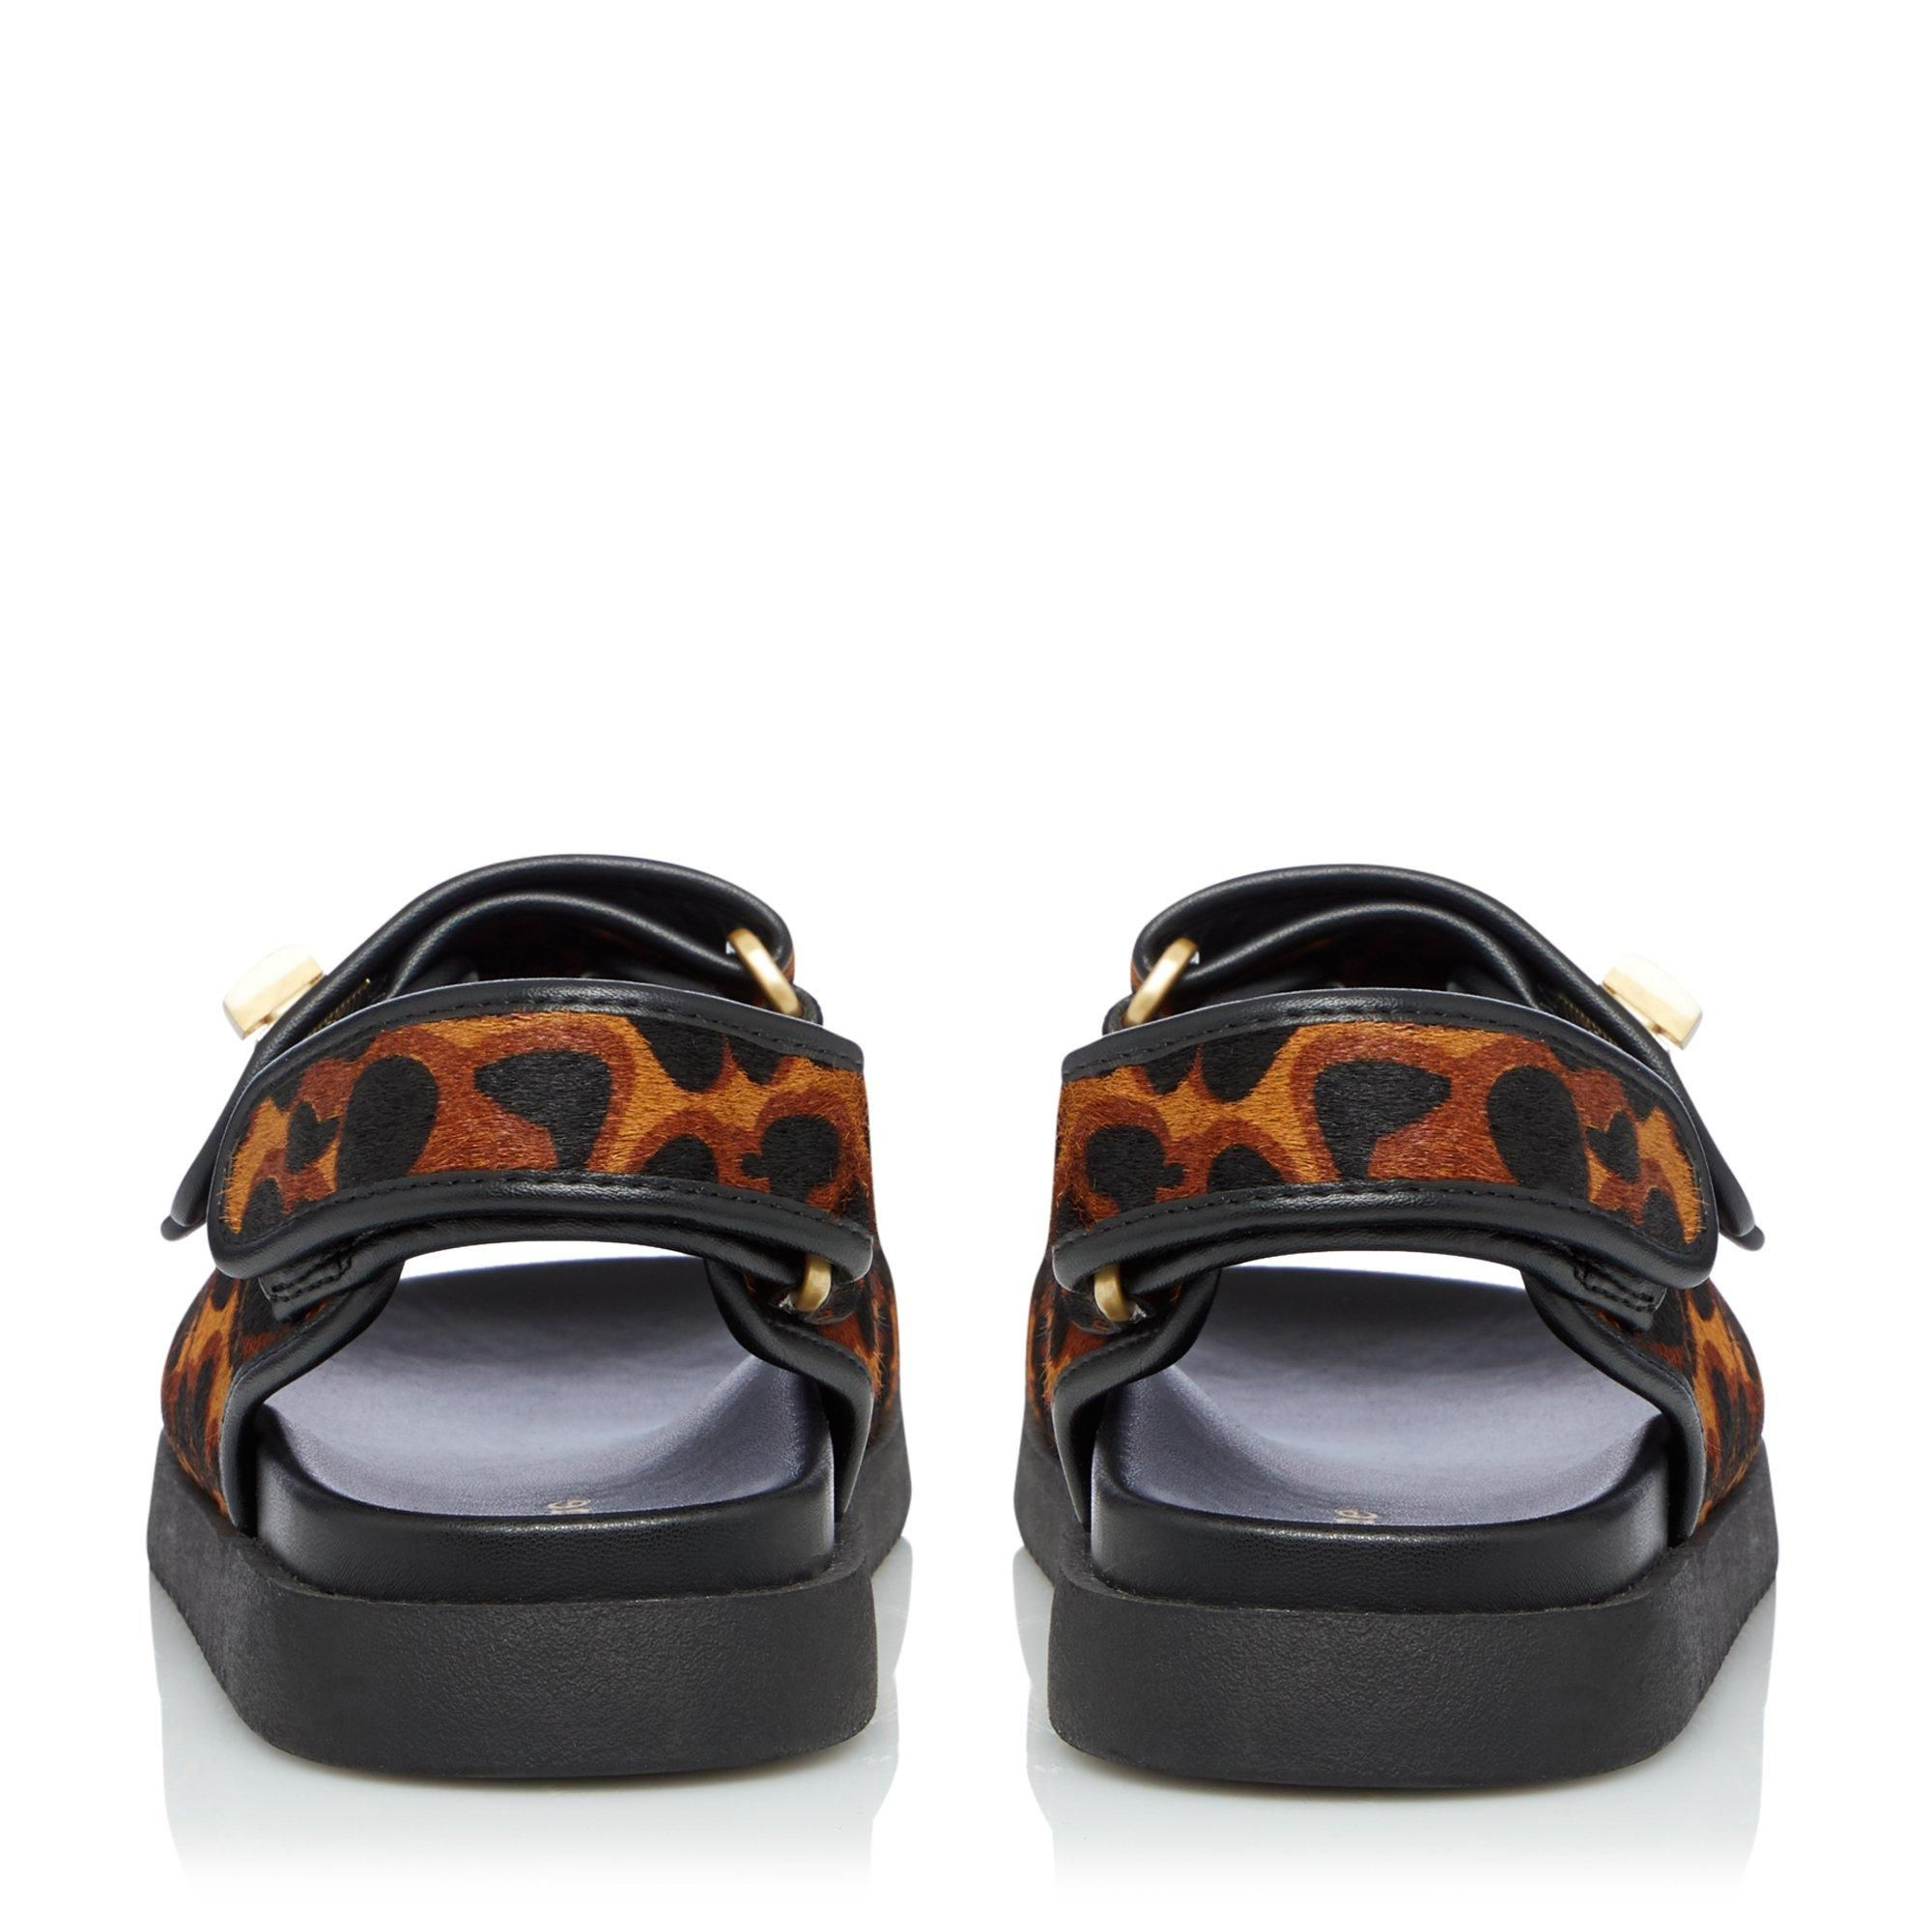 Dune Ladies LOCKSTOCKK Double Strap Flat Sandals